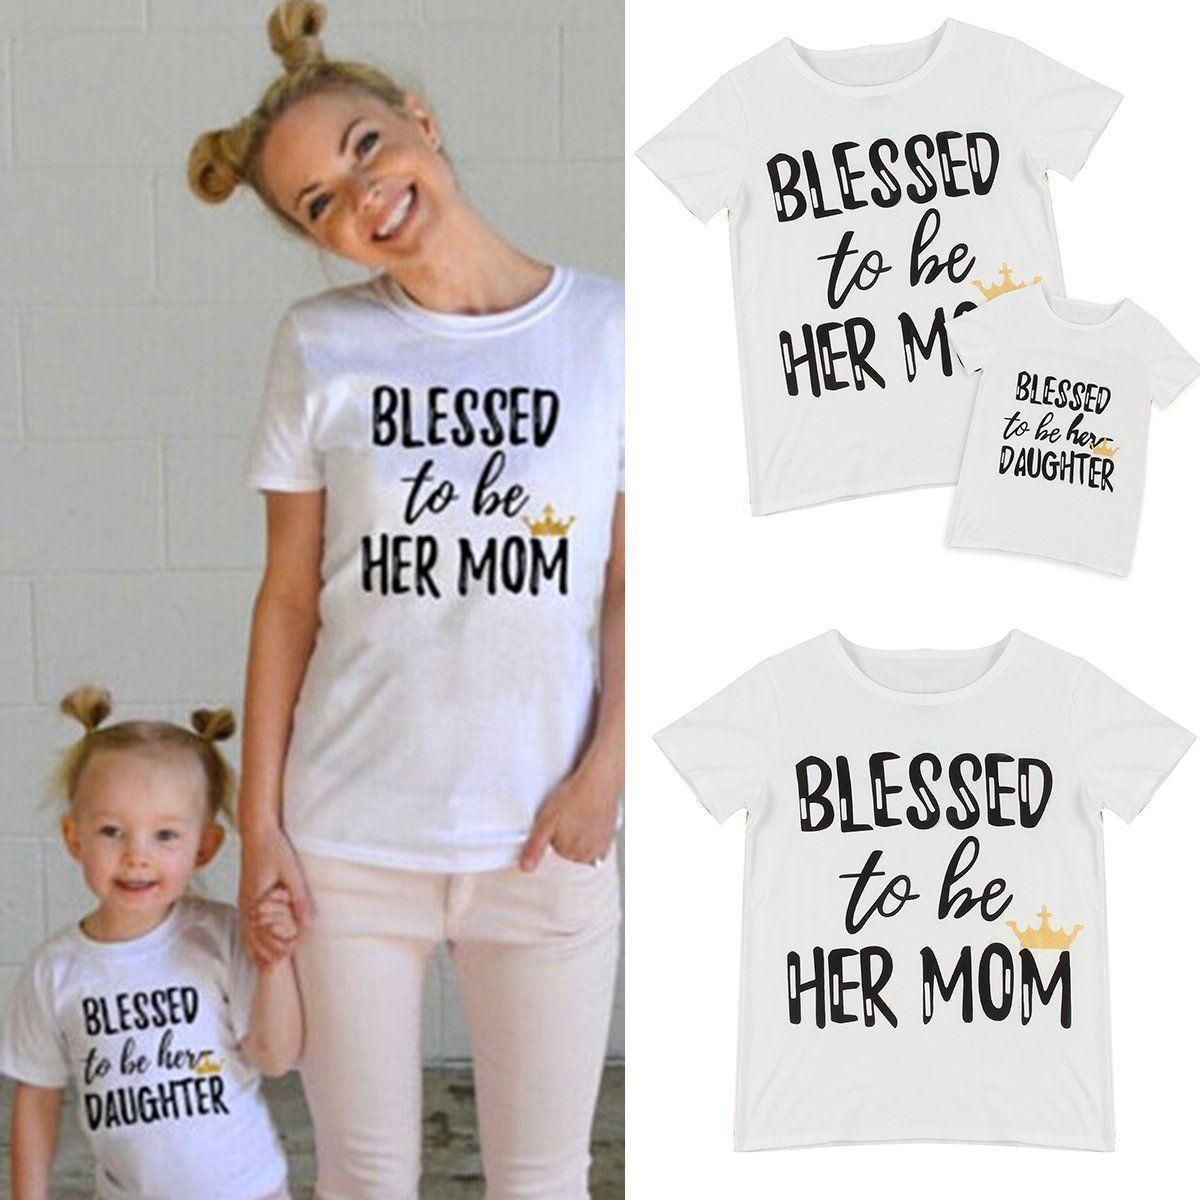 0f9365e2d46 Family T-Shirt Mother Daughter Short Sleeve Summer Cotton Tee Shirt Top  Clothing